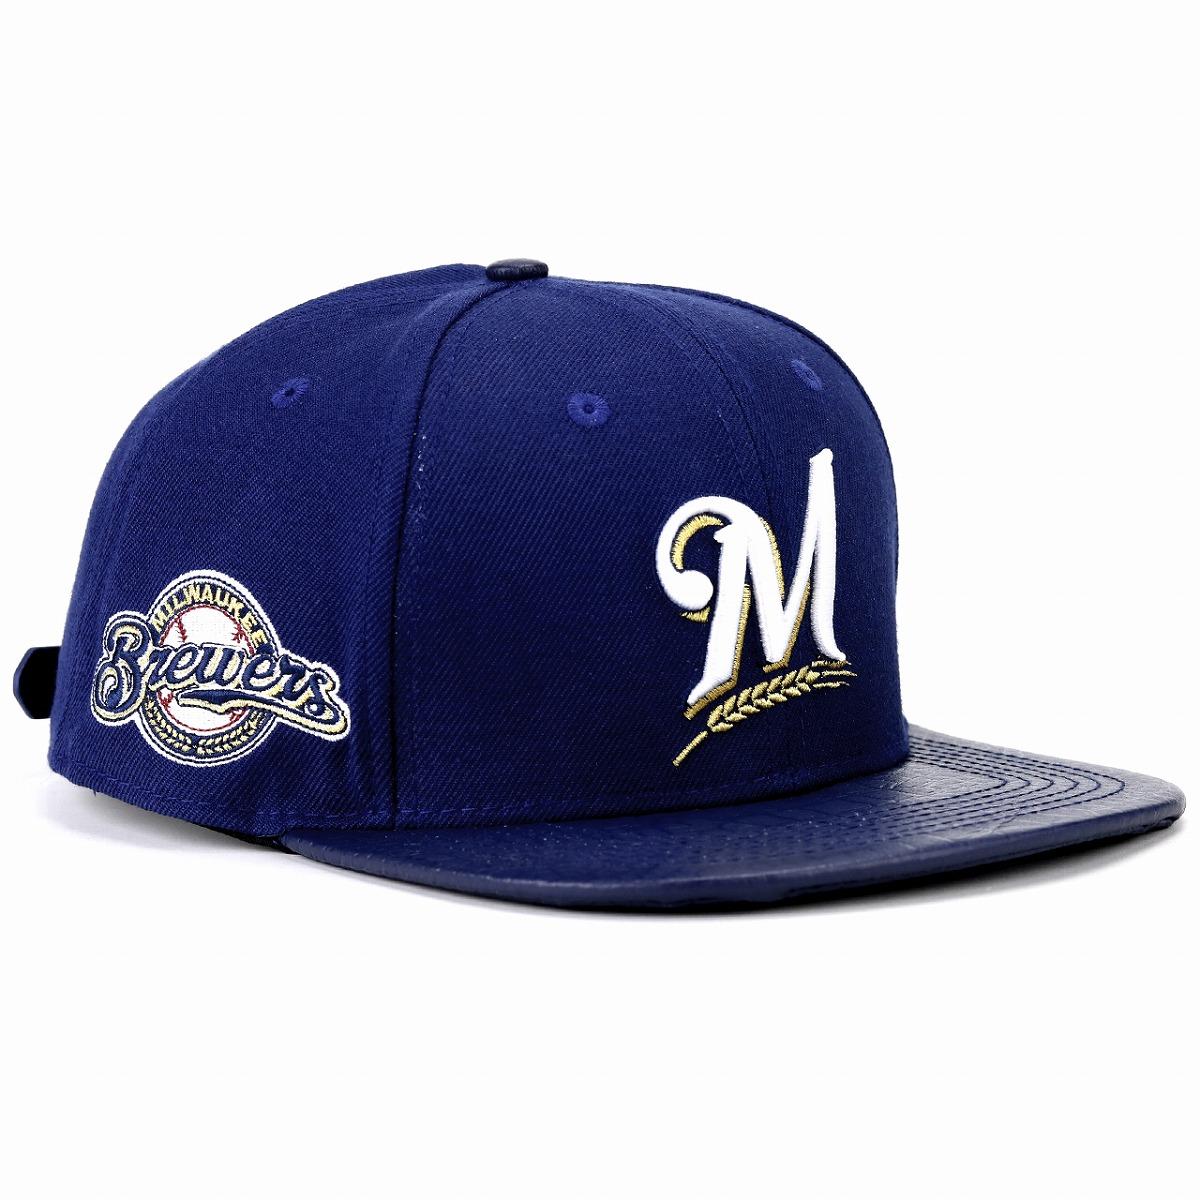 dd0cd3803 Milwaukee Brewers logo embroidery cap professional standard baseball cap  men gap Dis hat Pro Standard MLB Milwaukee Brewers Logo cap dark blue navy  ...